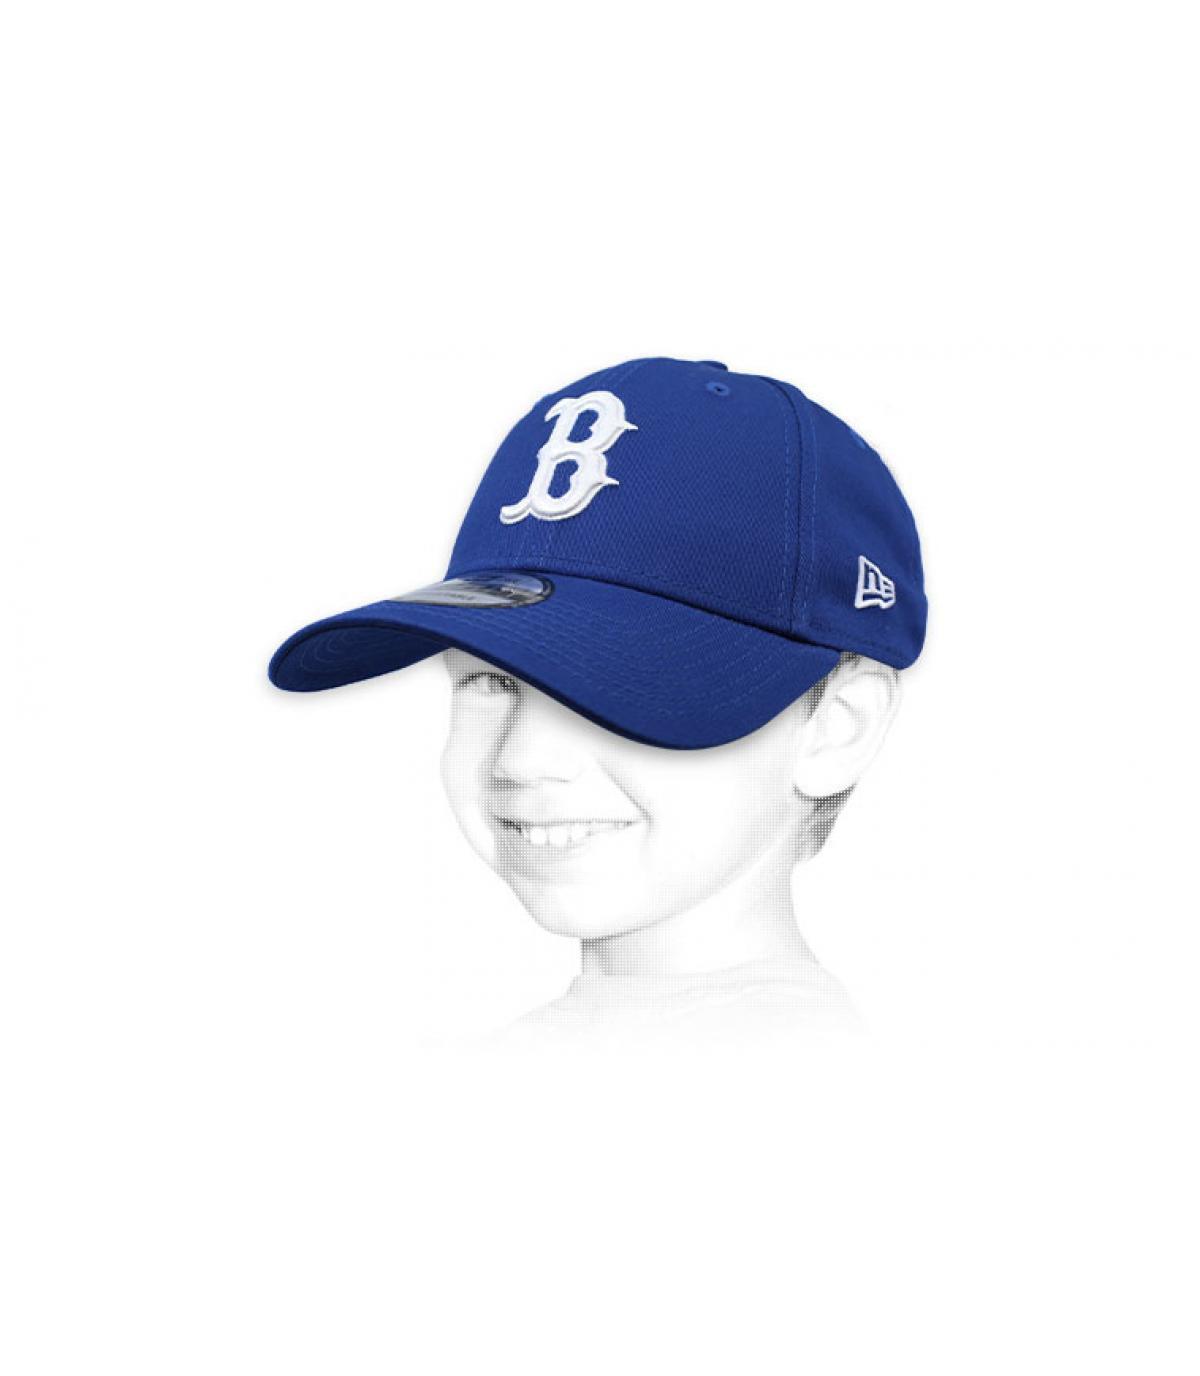 Kinder Cap B blau